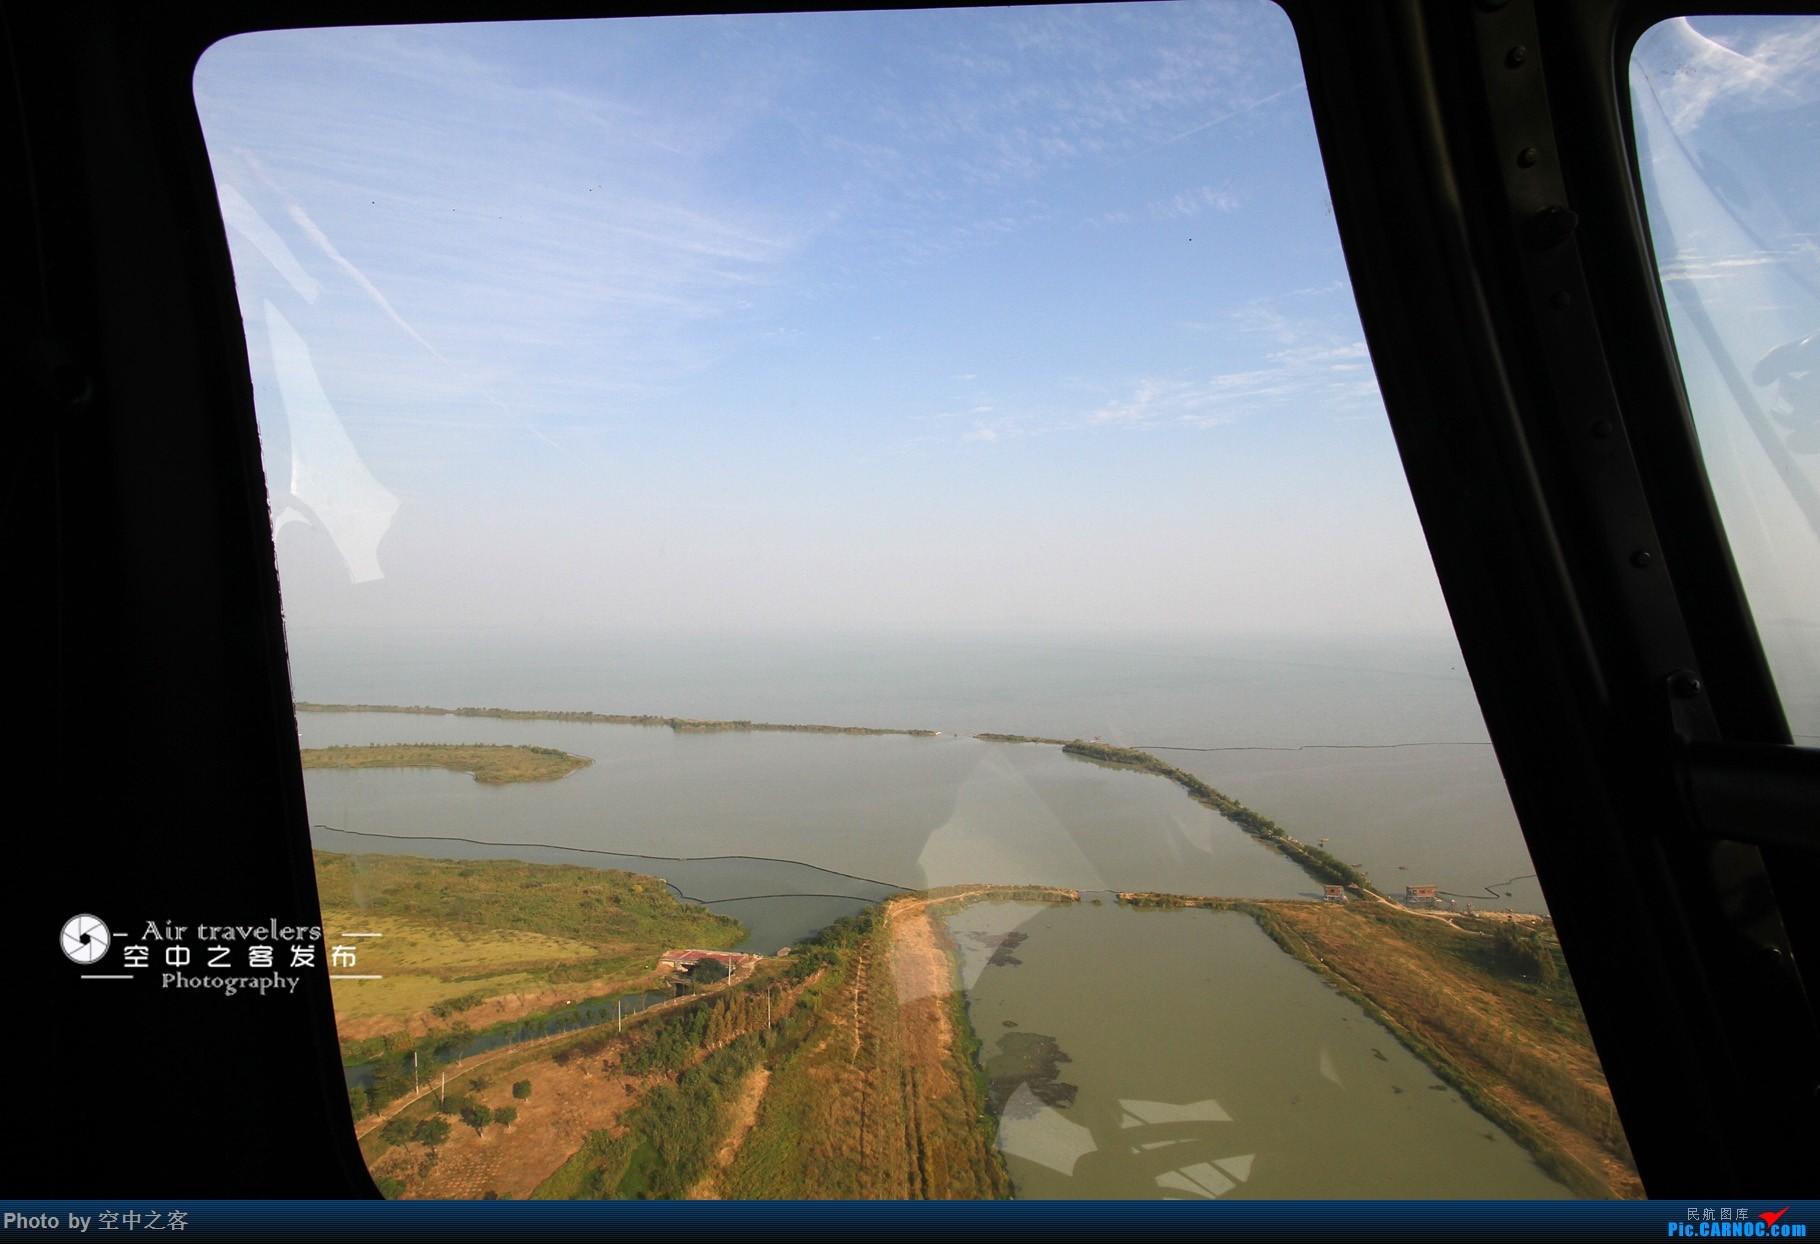 Re:[原创][空中之客发布]与aiolia7456大佬体验顶宏通航R-44滨湖之旅 ROBINSON R44 II B-7261 滨湖